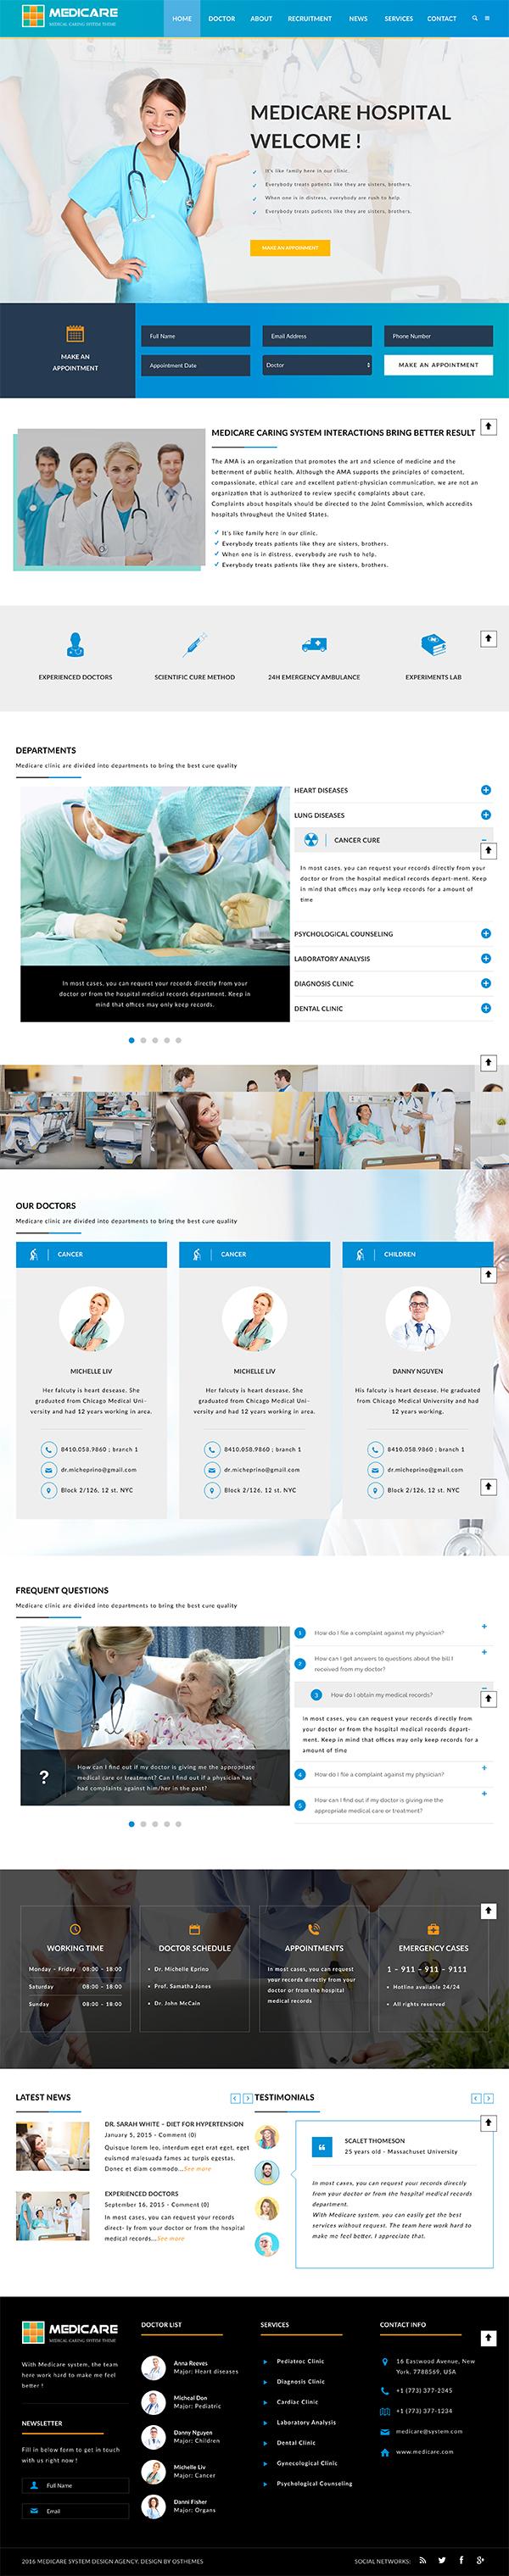 14 Medicare - Medical and Health Responsive WordPress Theme